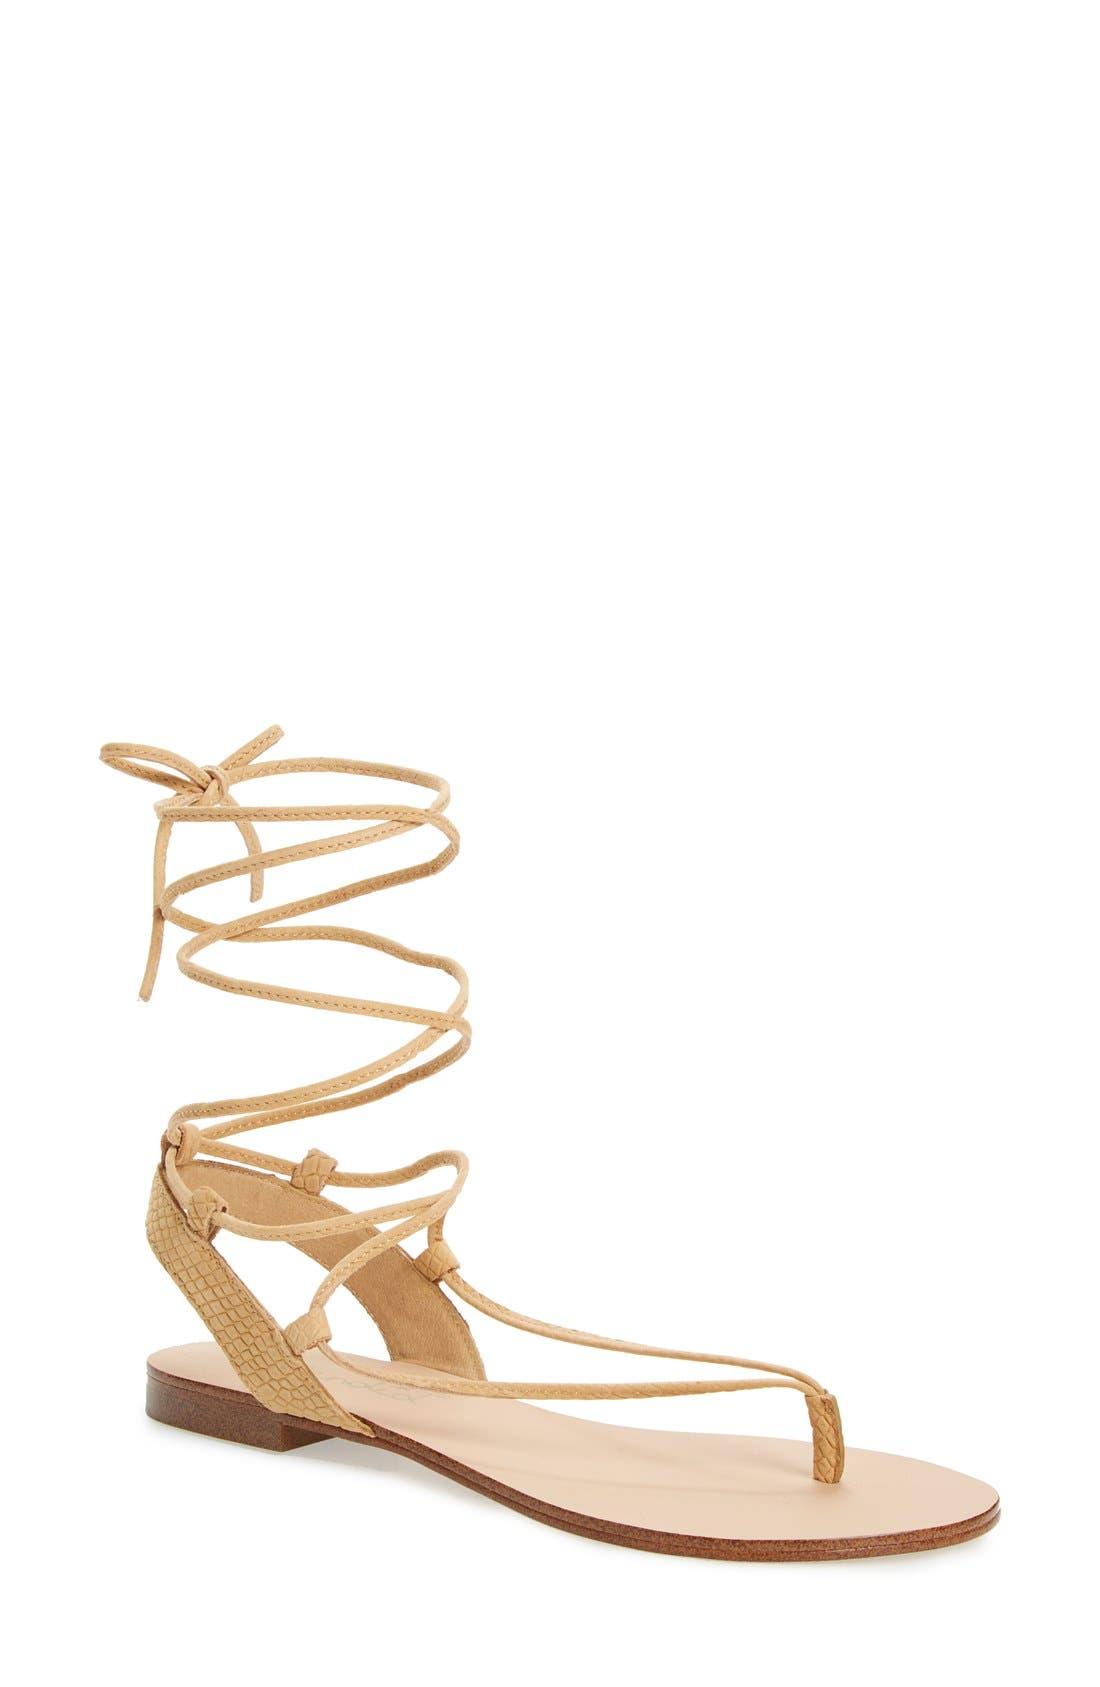 Main Image - Splendid 'Candee' Wraparound Lace Flat Sandal (Women)